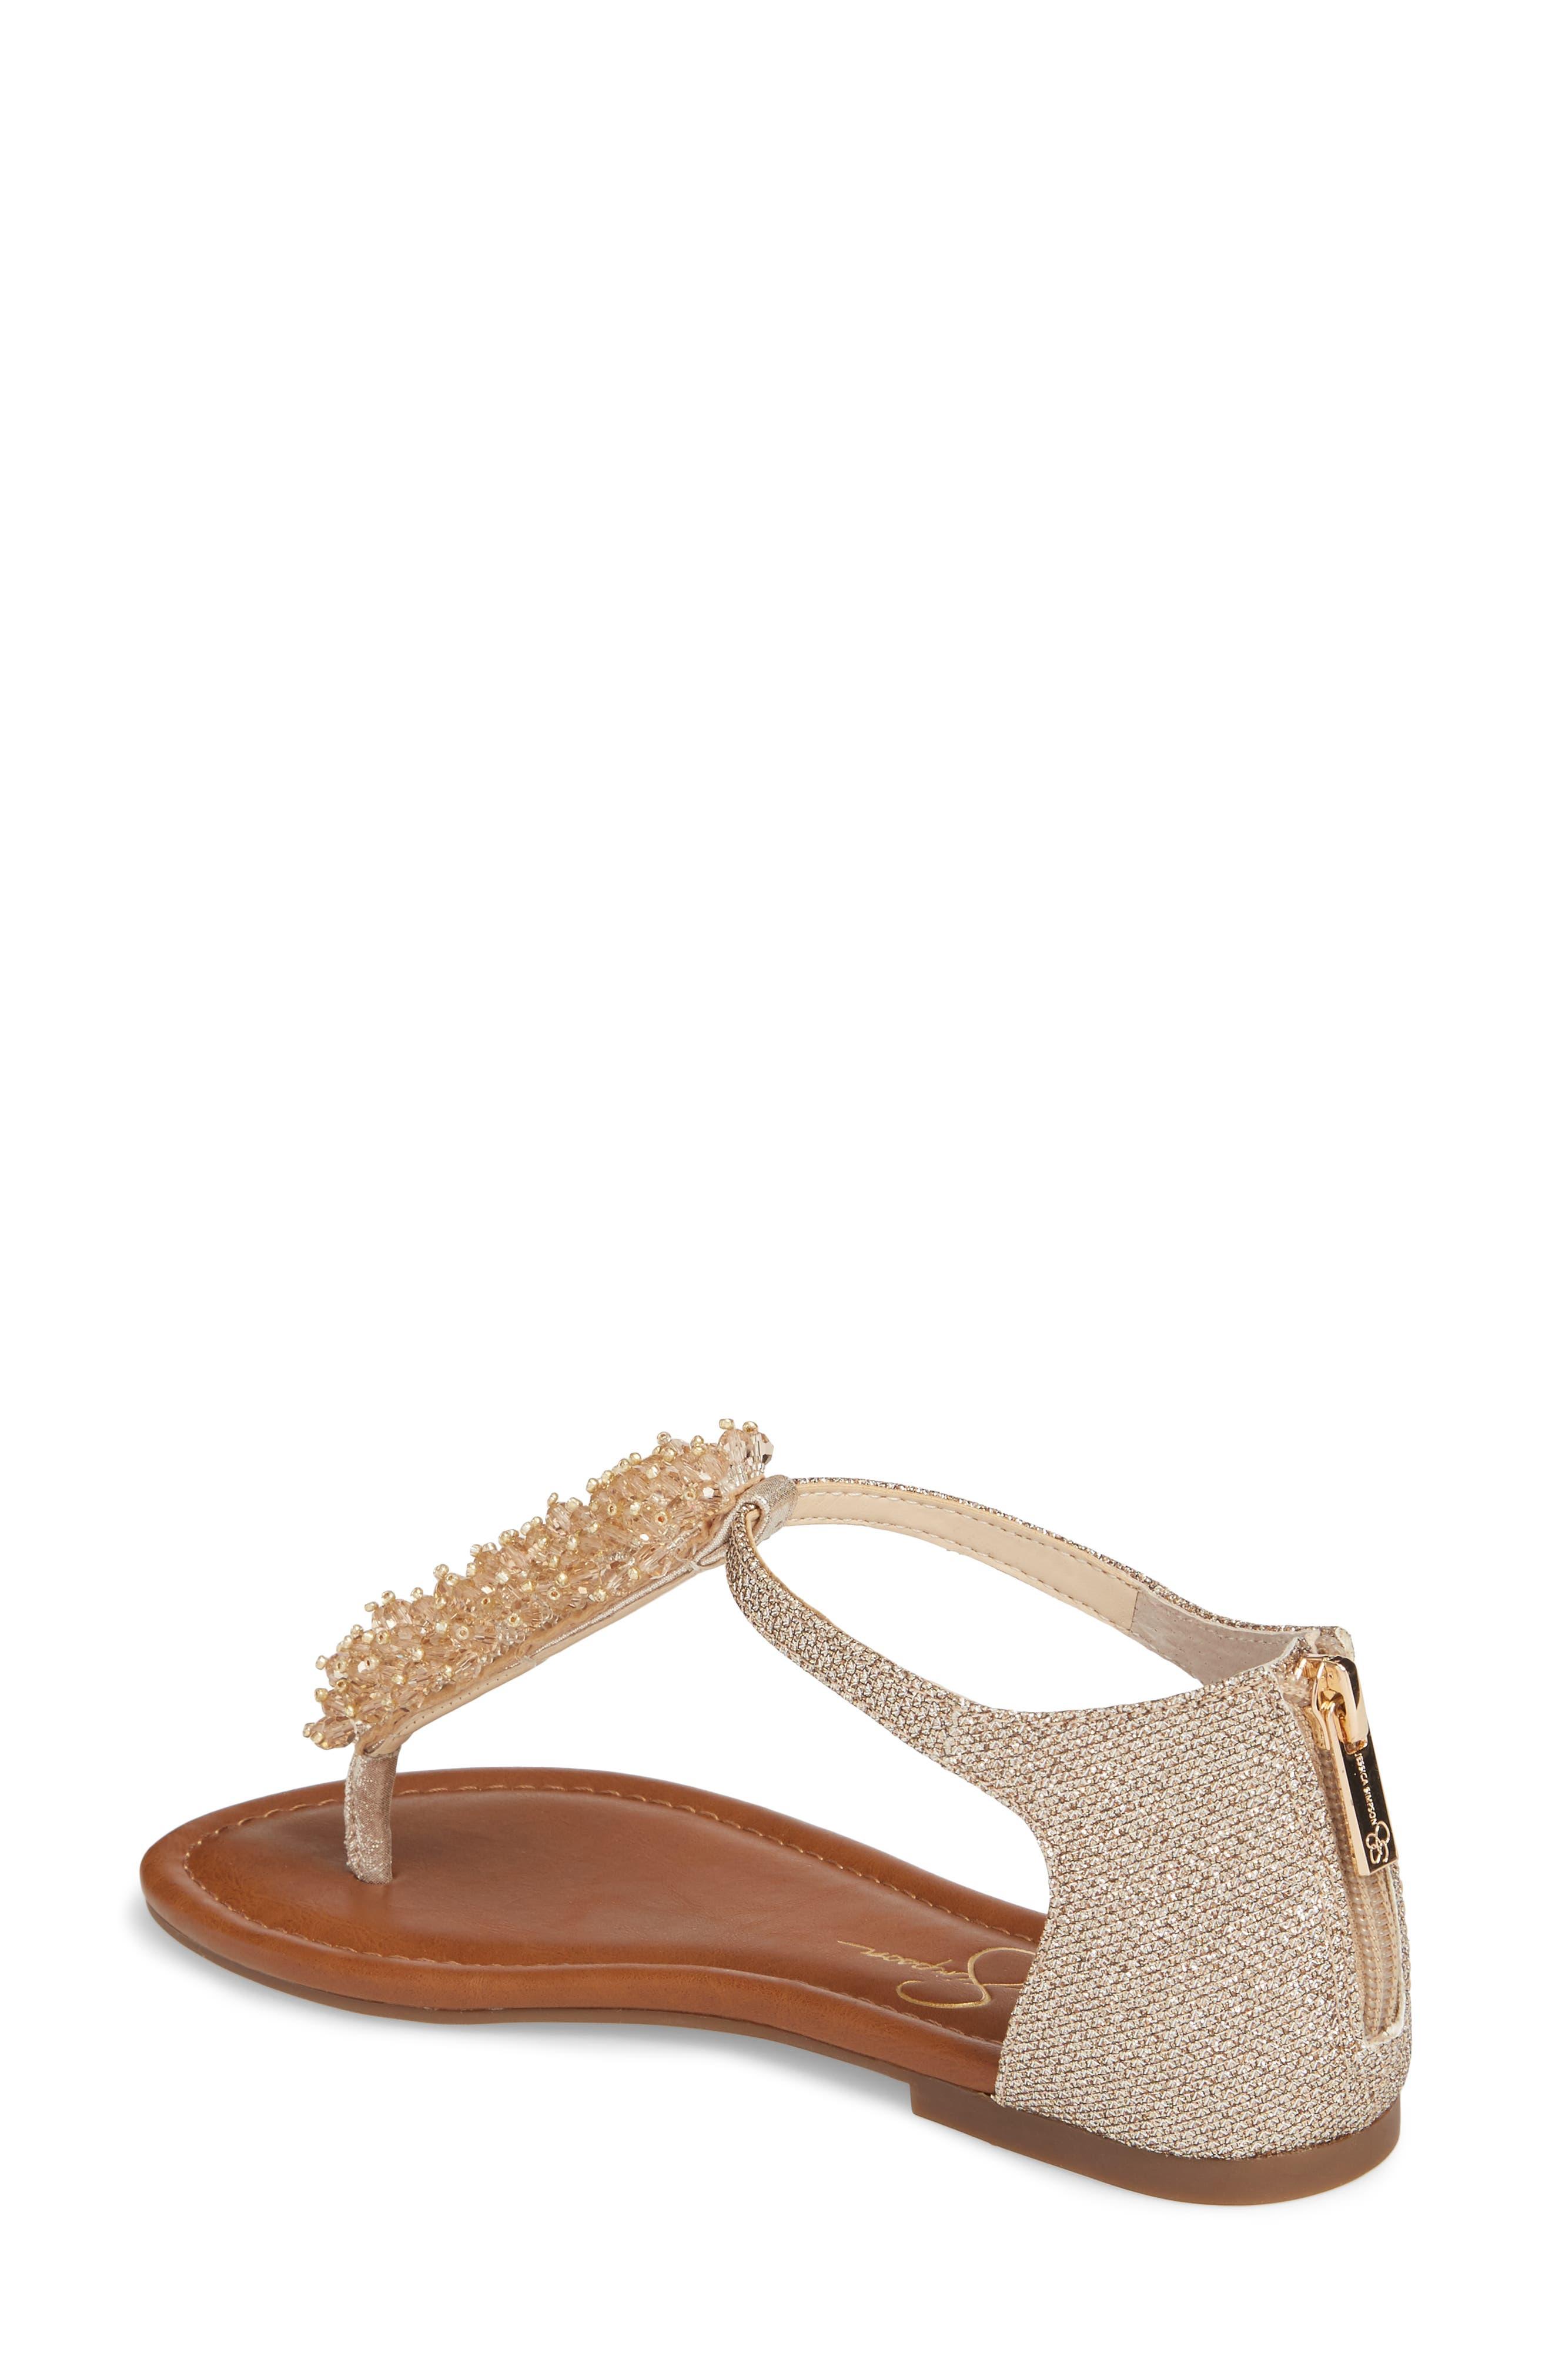 Kenton Crystal Embellished Sandal,                             Alternate thumbnail 4, color,